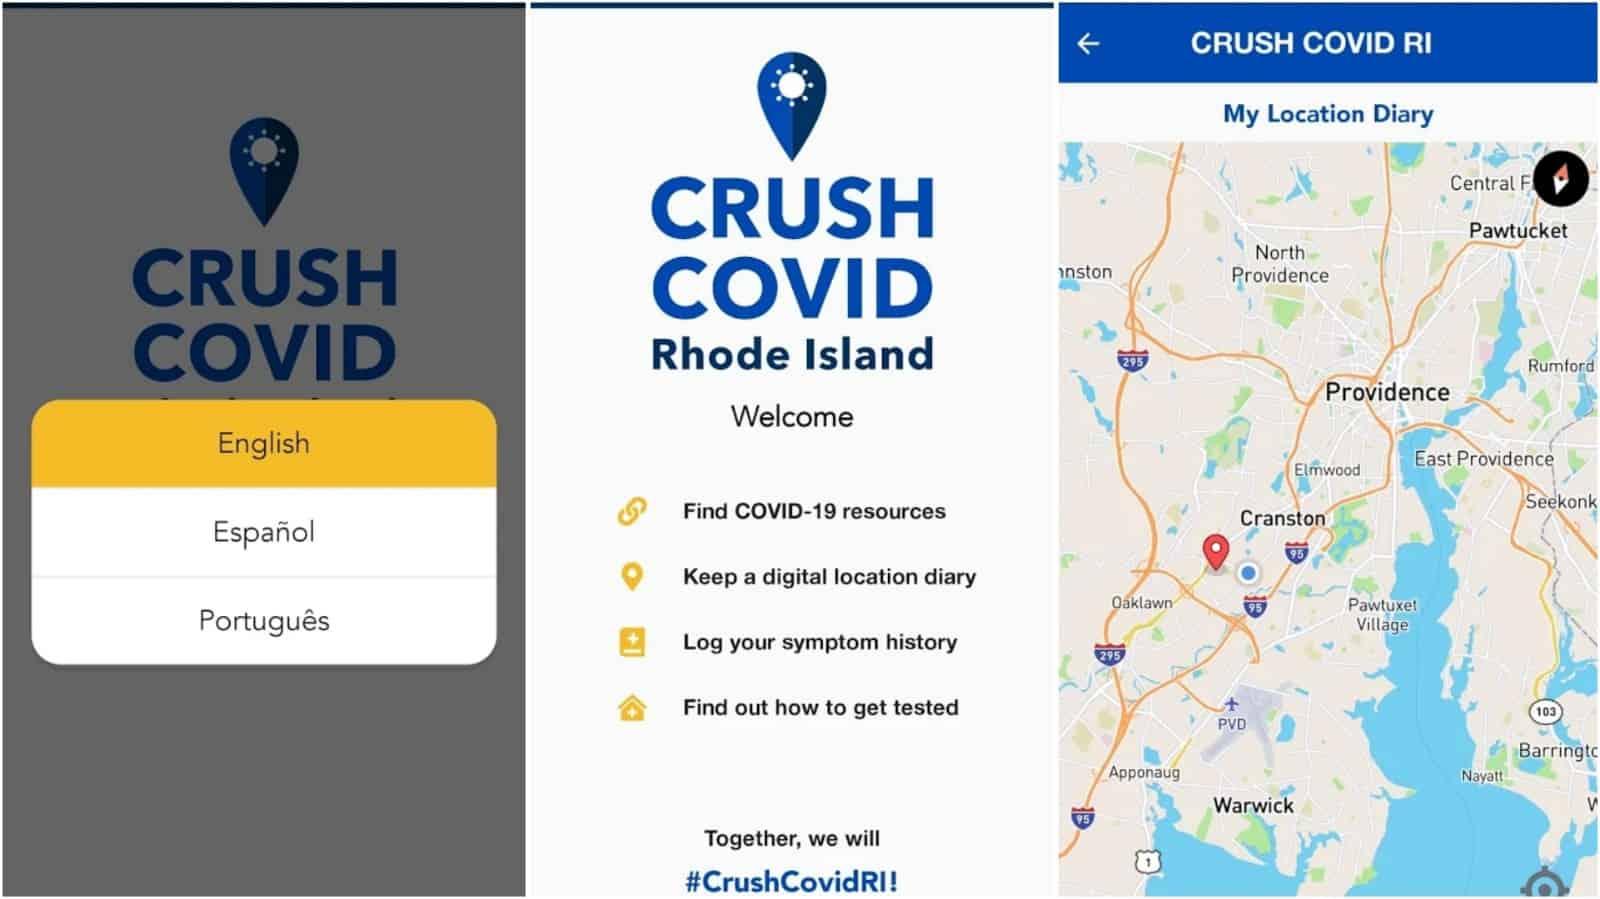 CRUSH COVID RI app grid image